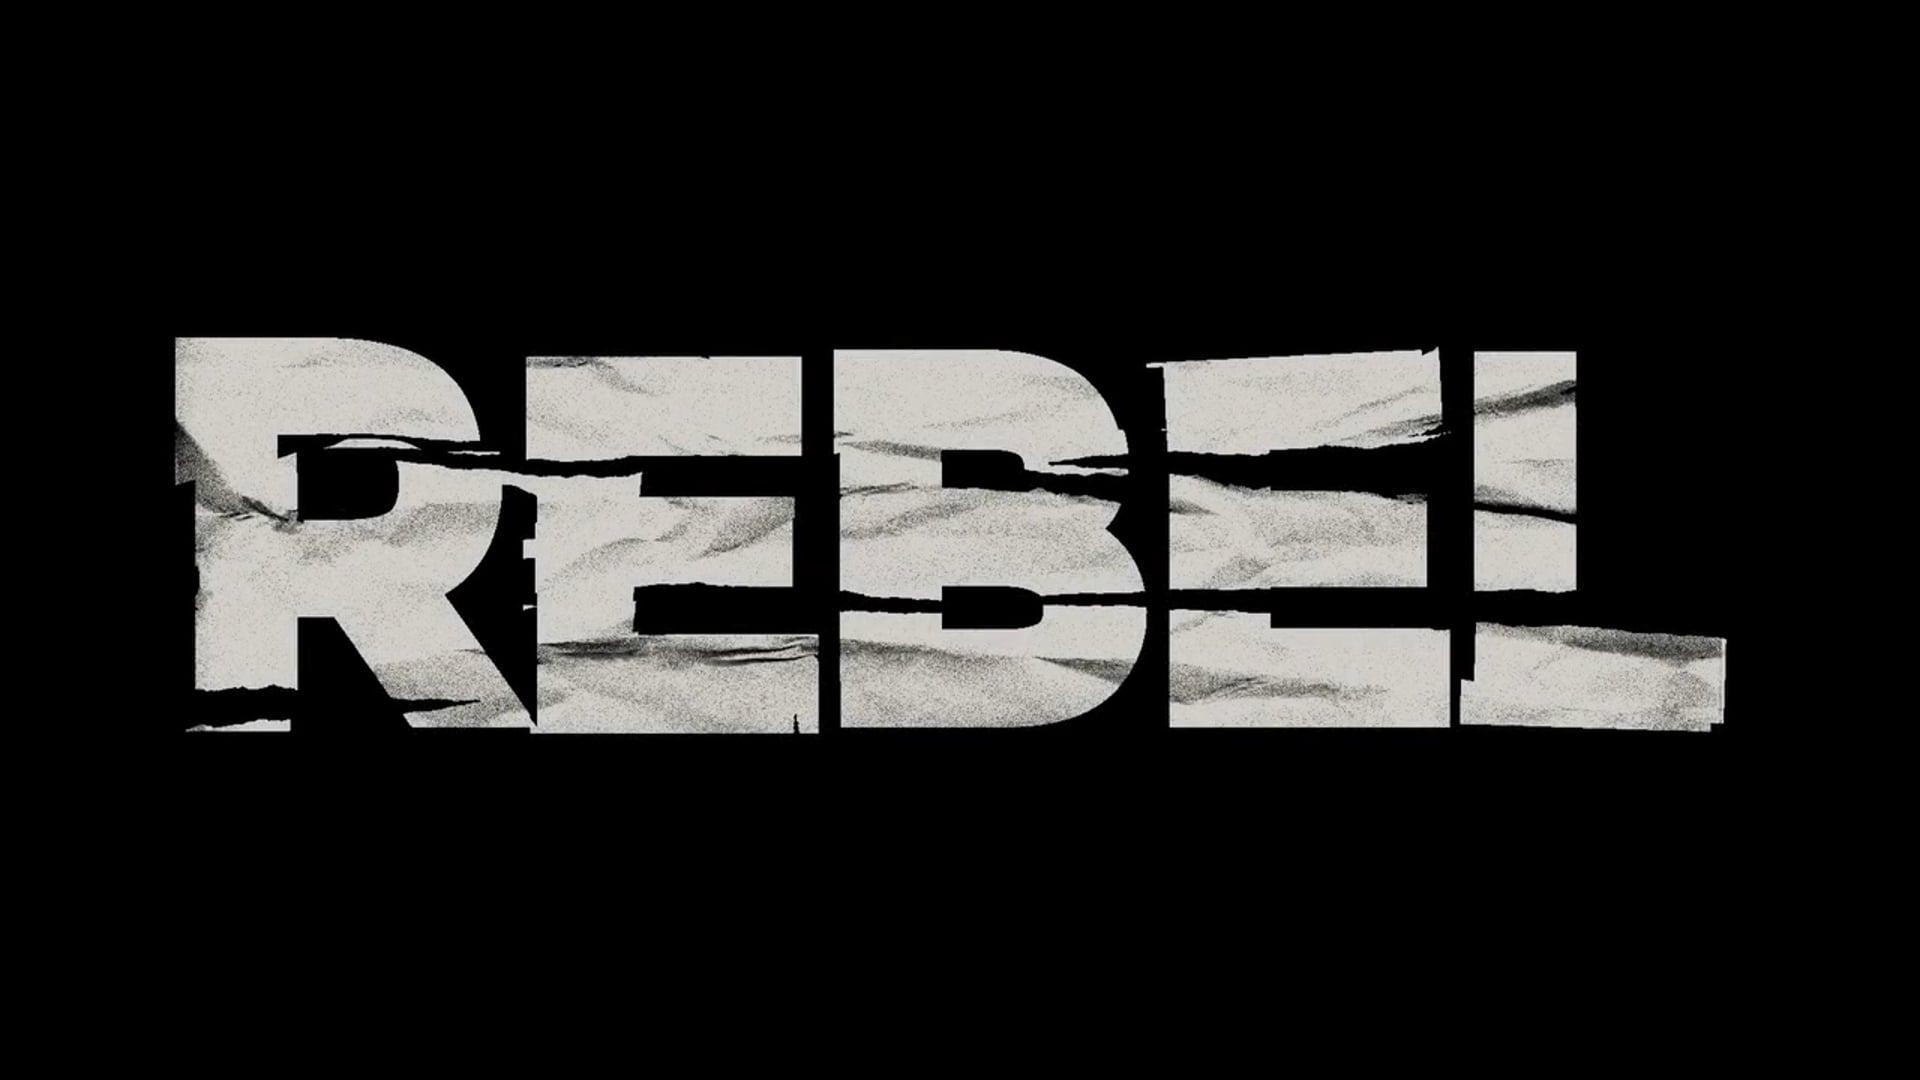 REBEL on BET